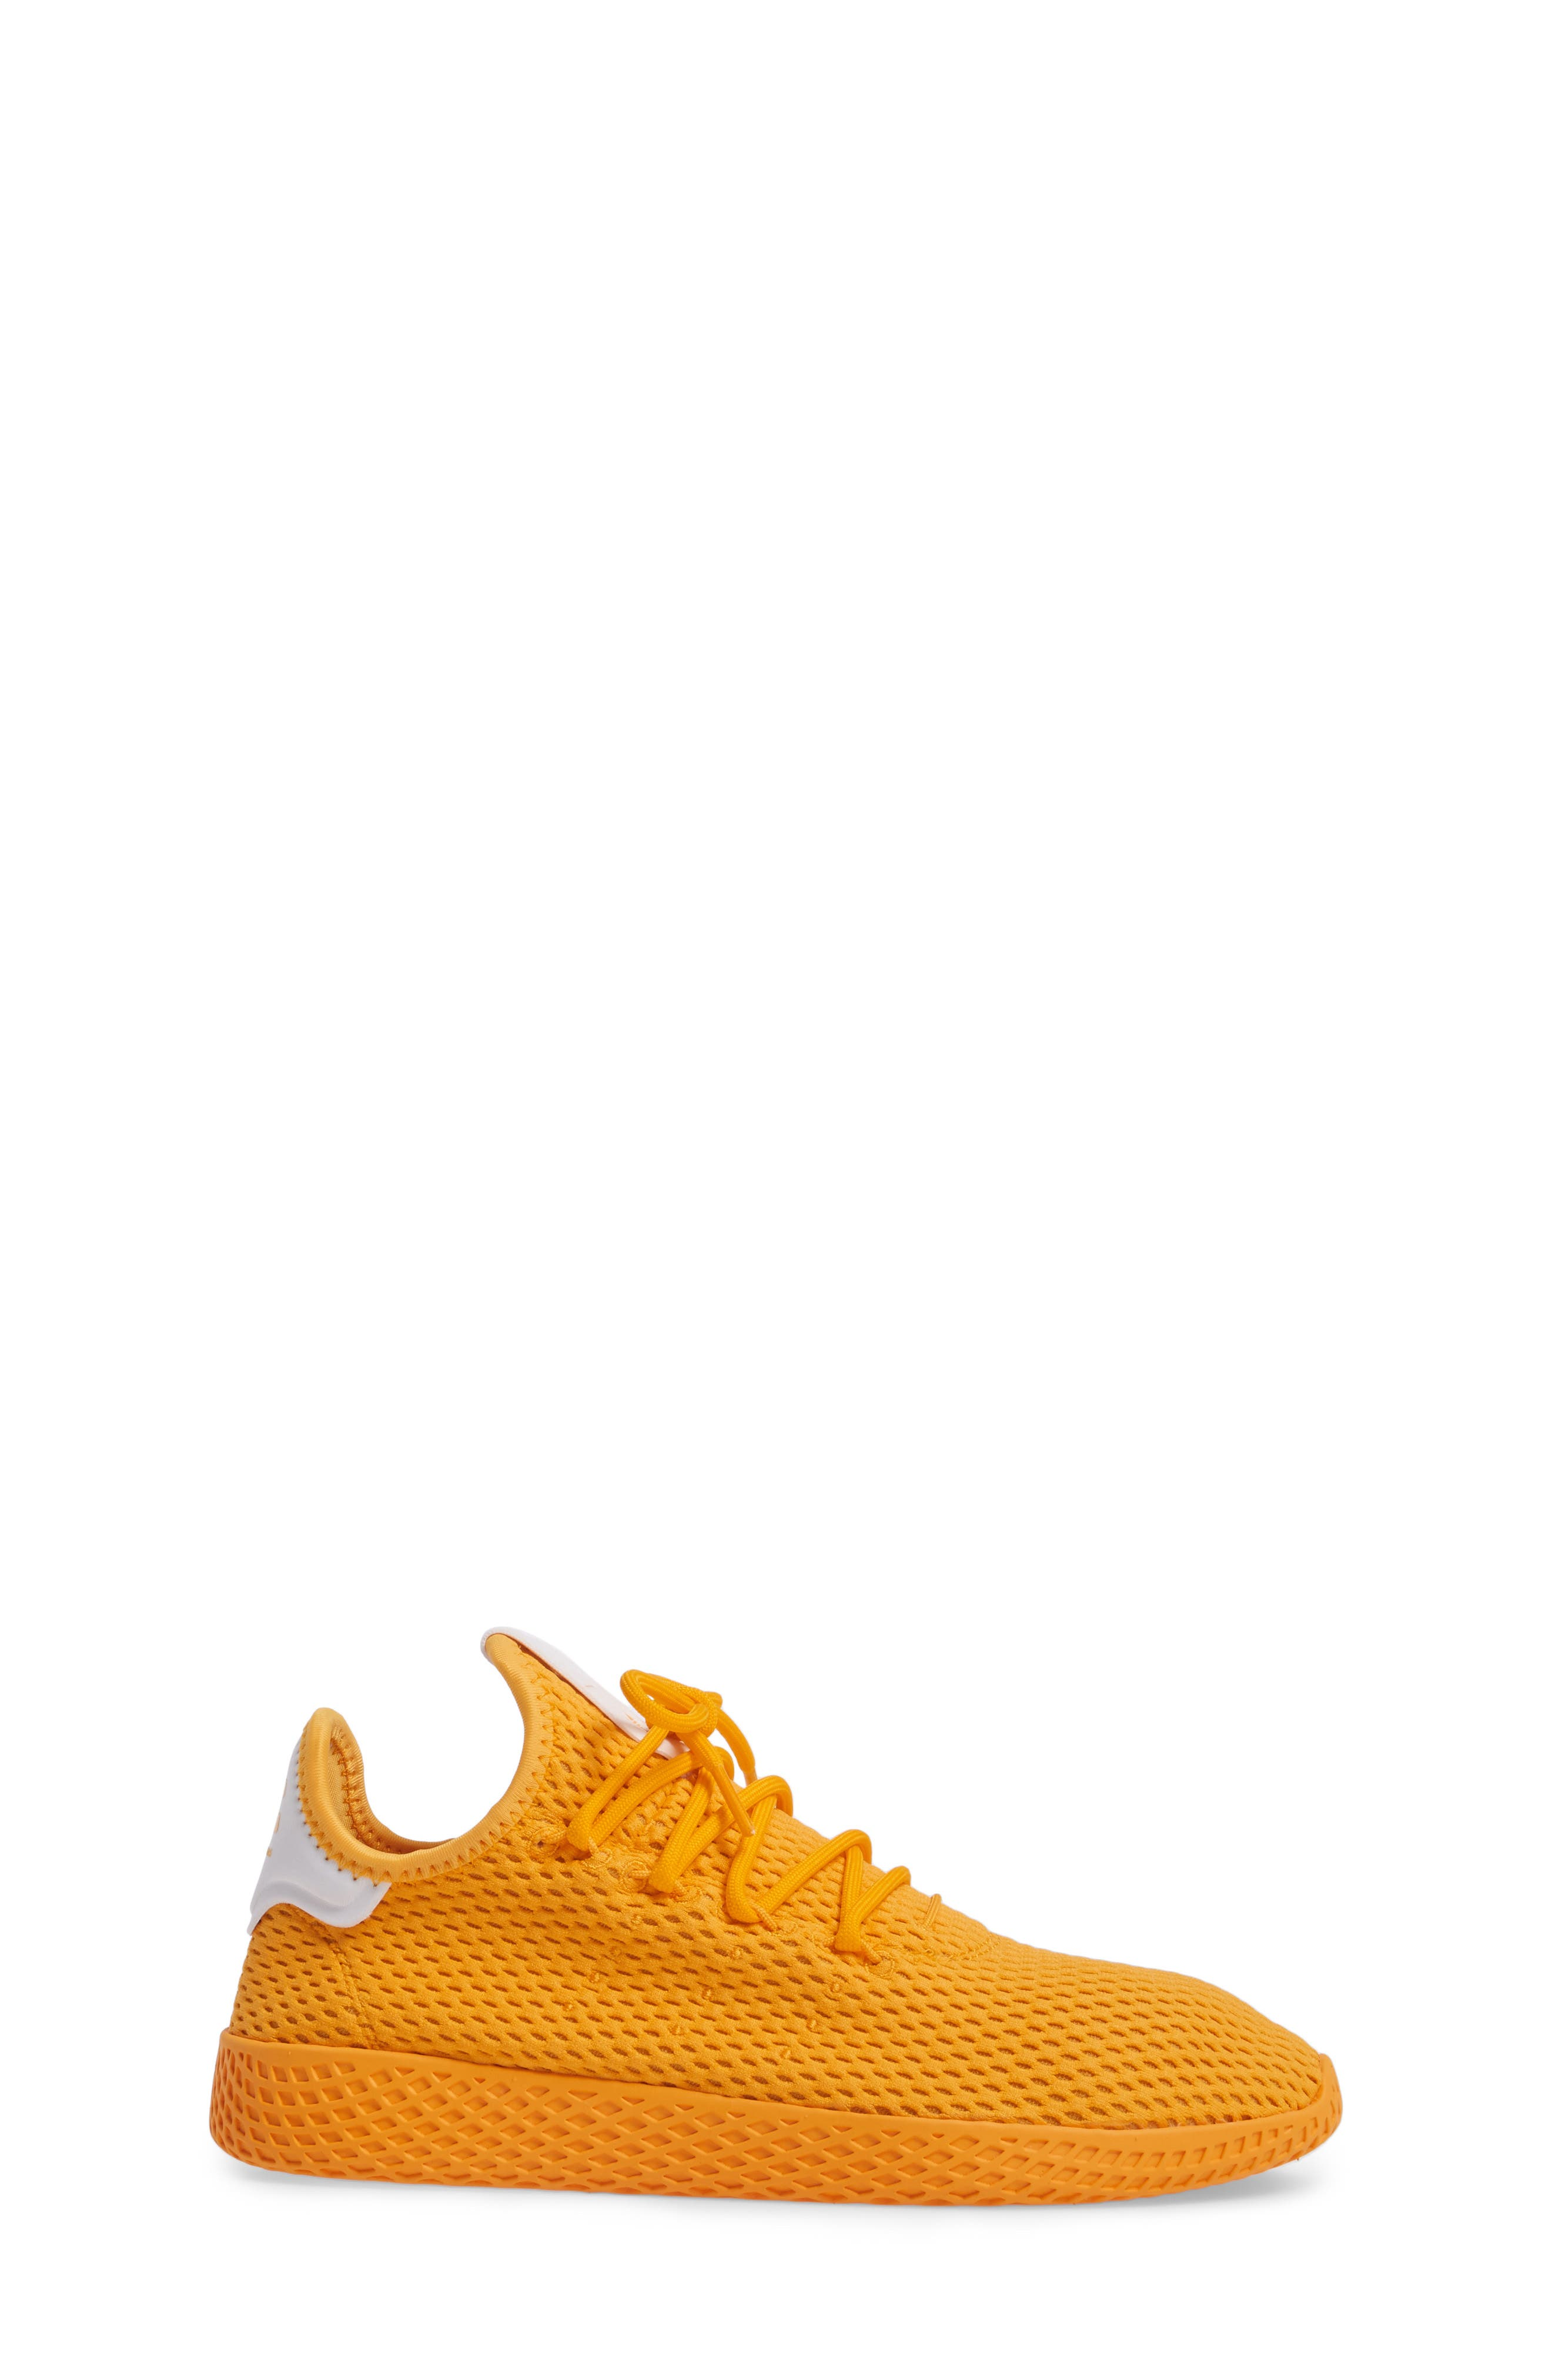 Alternate Image 3  - adidas Originals x Pharrell Williams The Summers Mesh Sneaker (Big Kid)